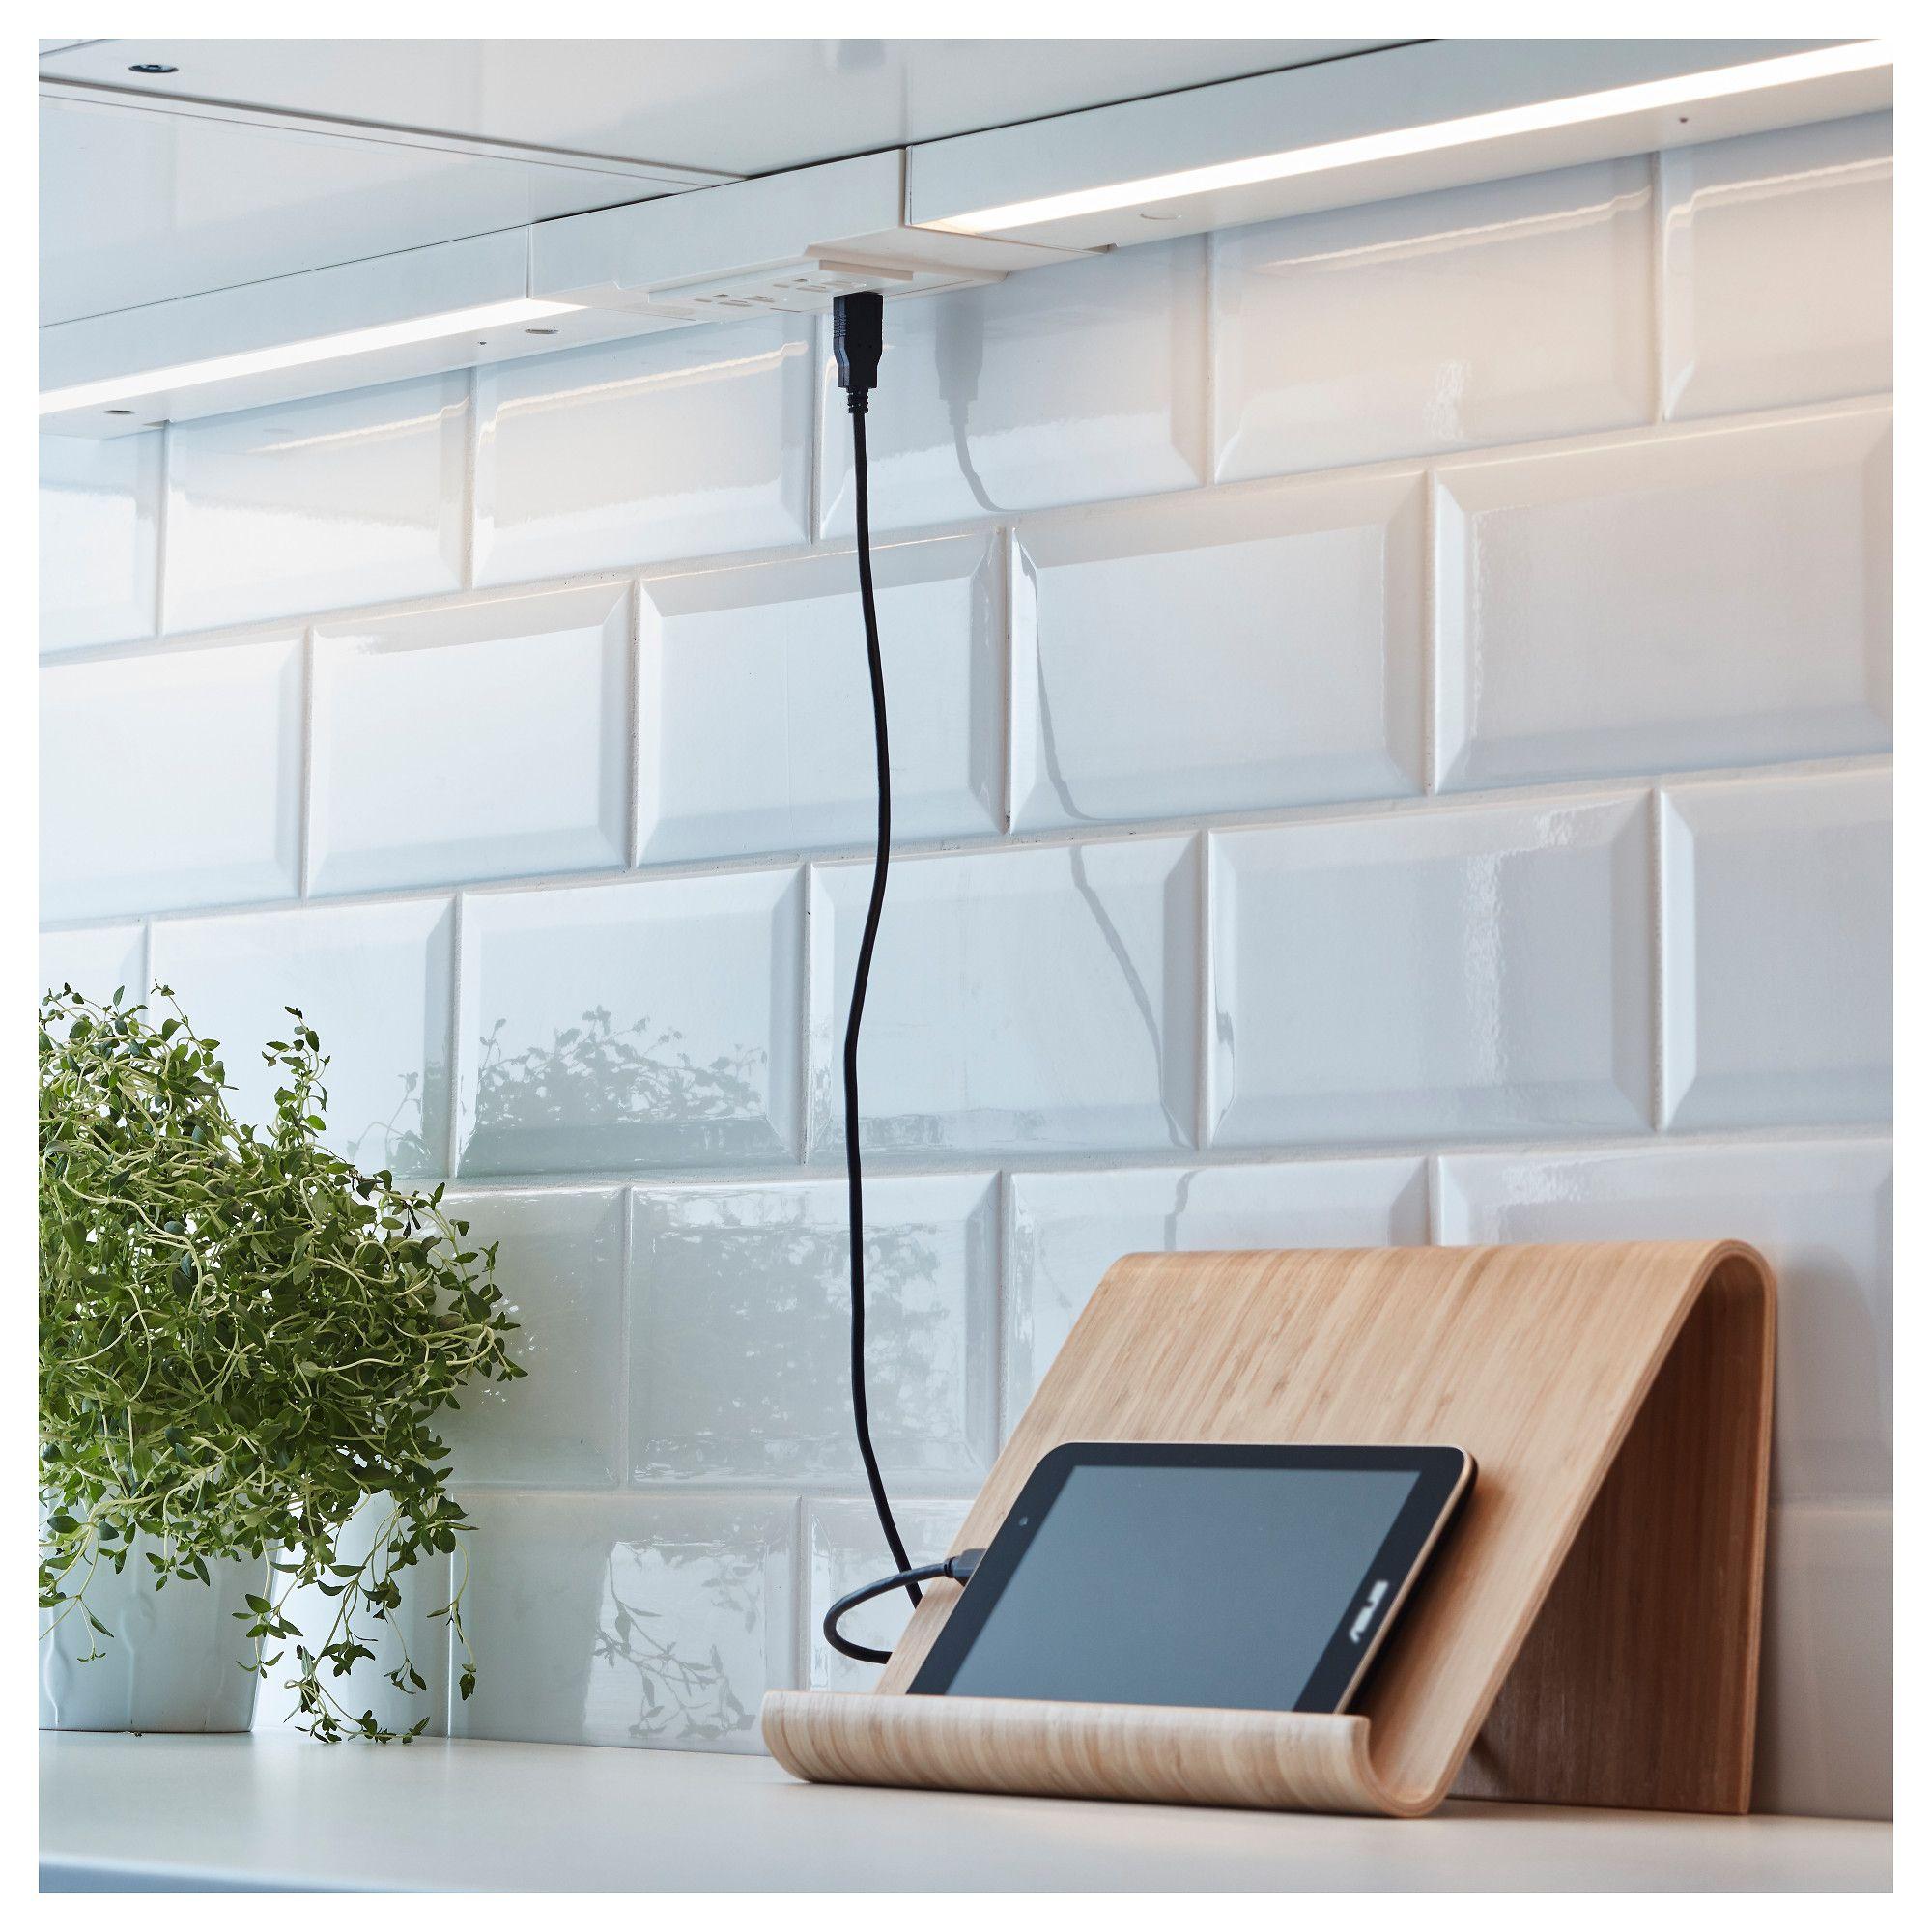 Under Cabinet Plug Strips Kitchen: UTRUSTA 2 Outlet Power Strip With USB Port White